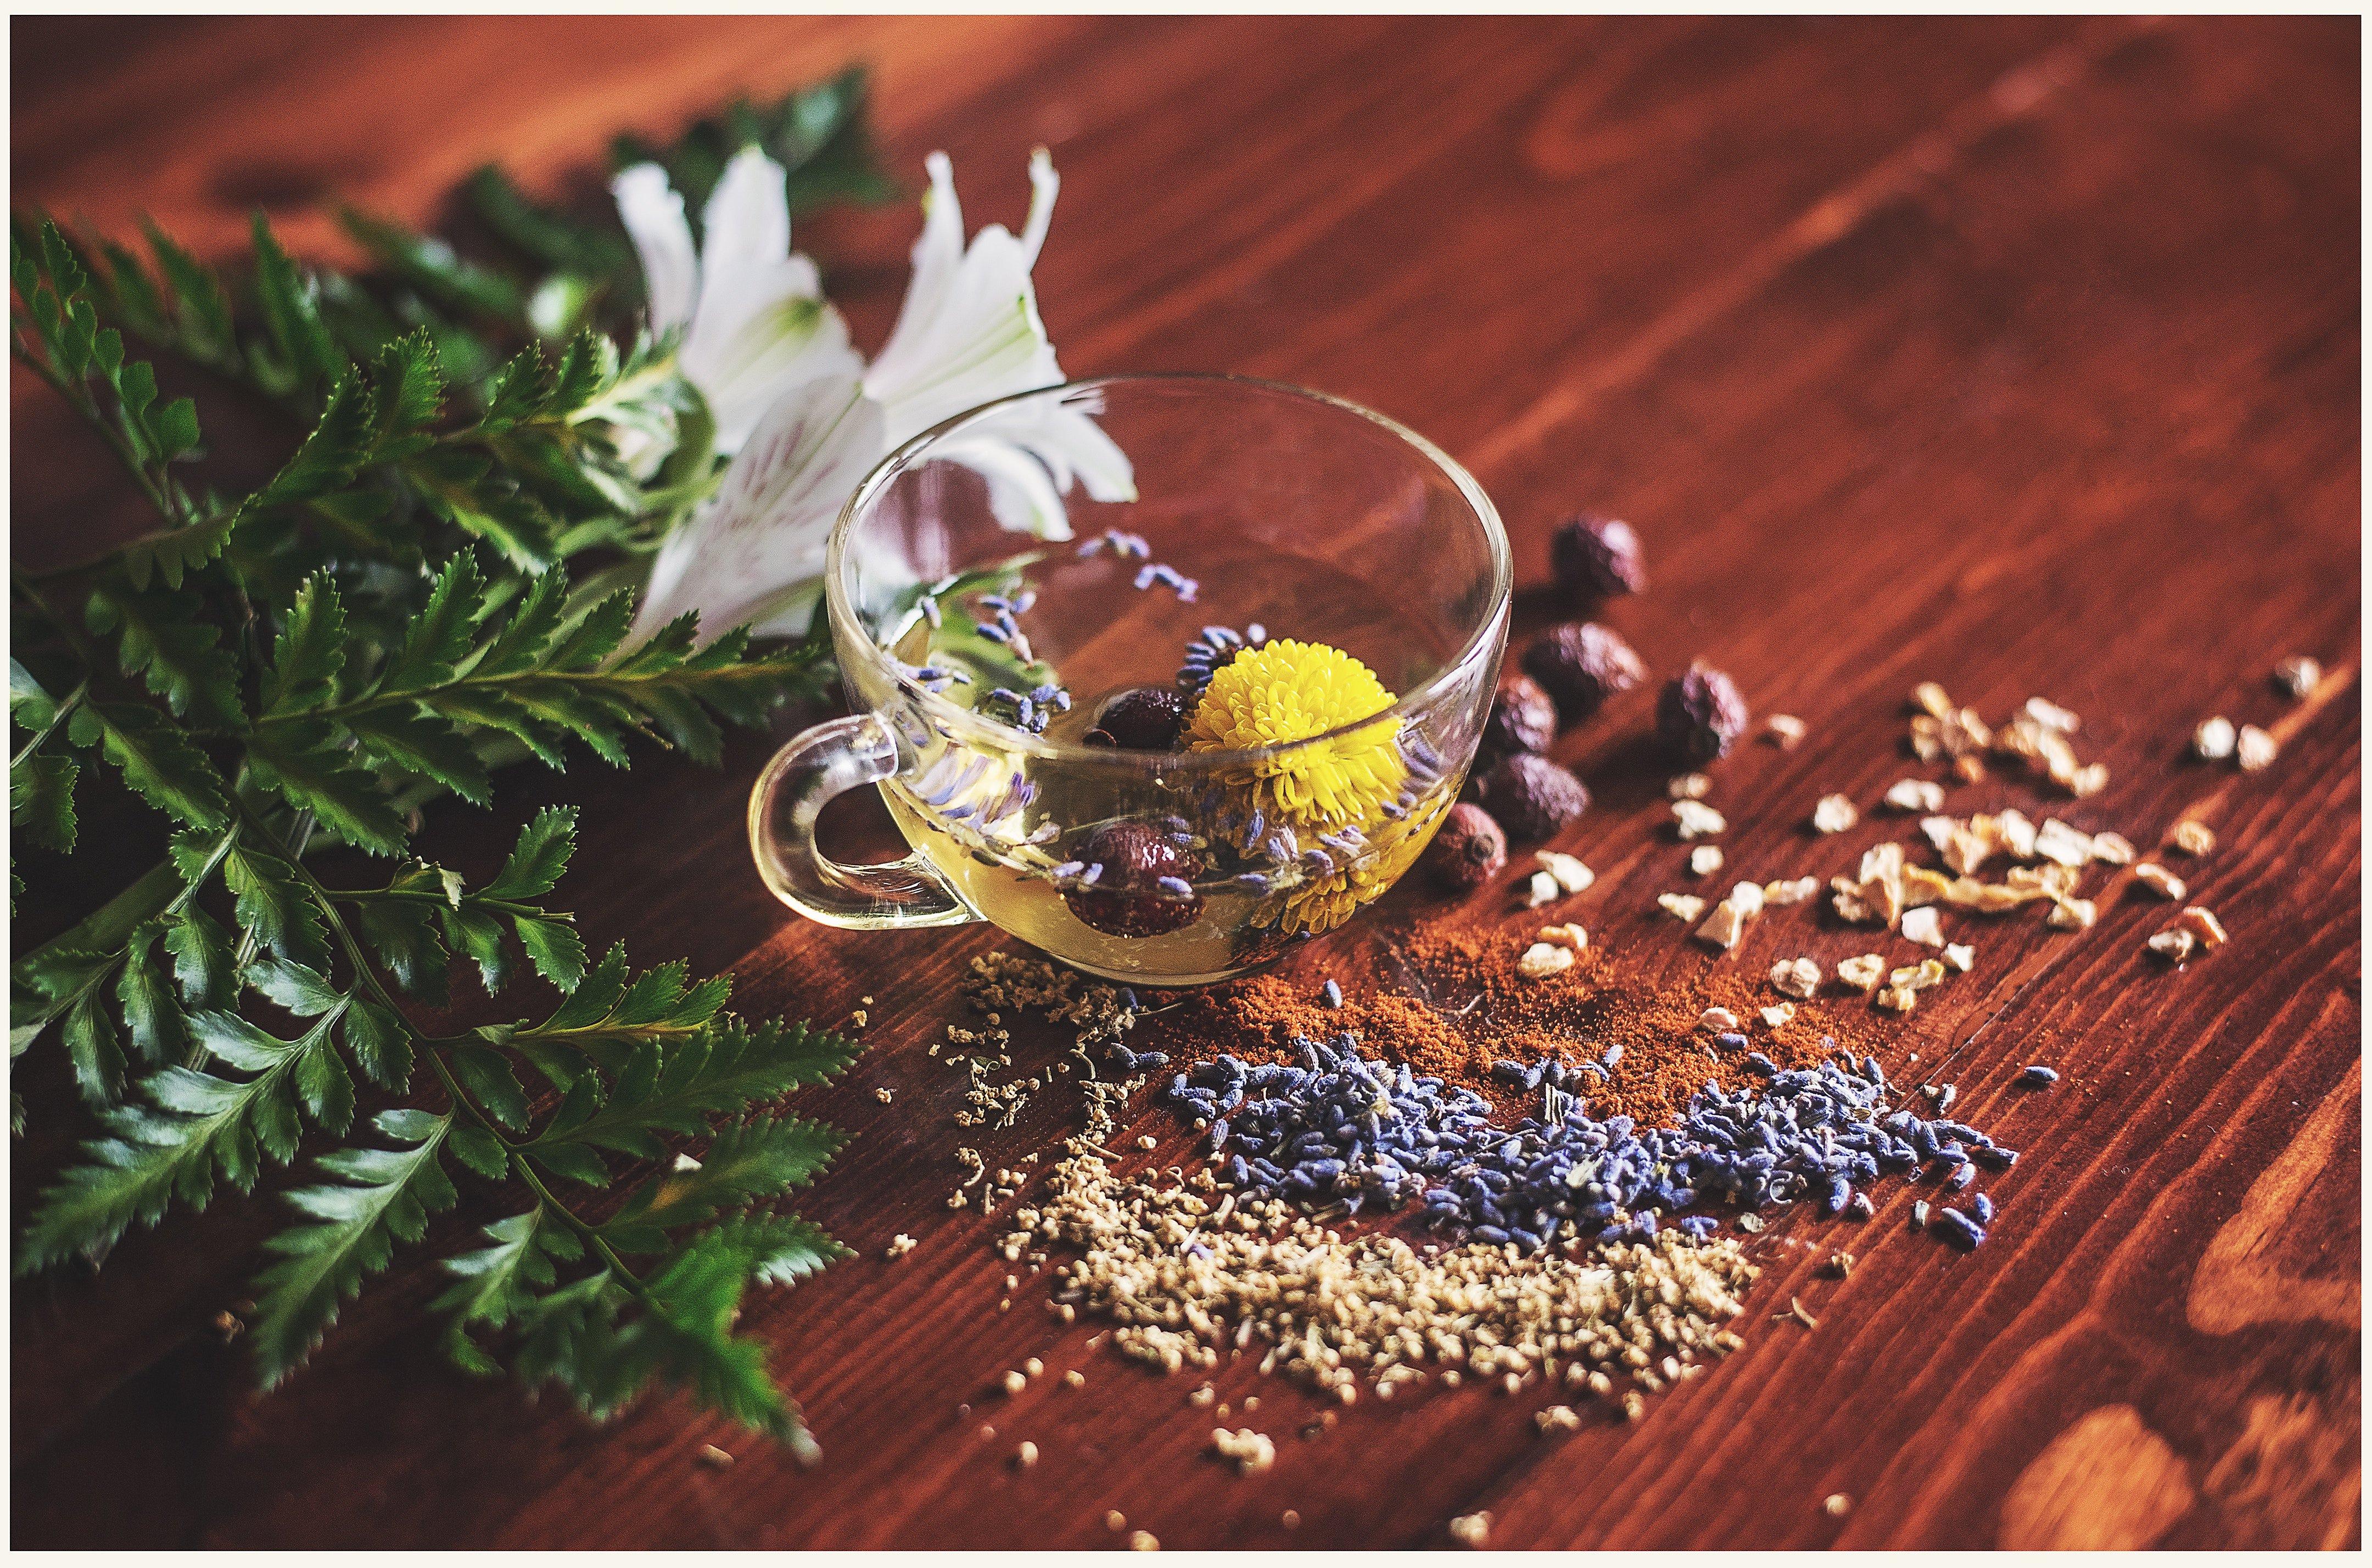 Demonstration of Herbal Remedies: Direct Resonance Testing